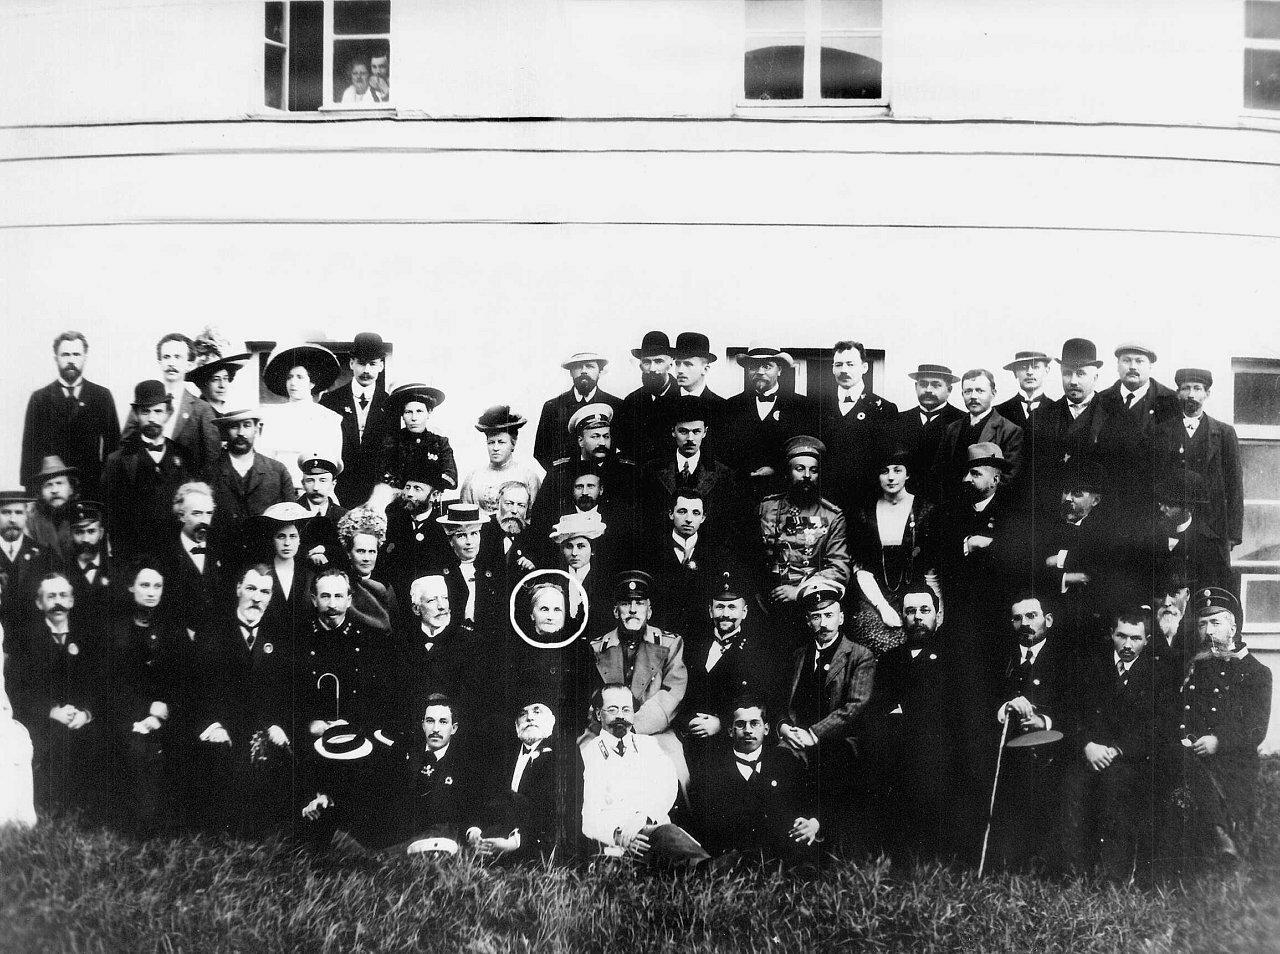 Участники XV археологического съезда в в Новгороде. 1911